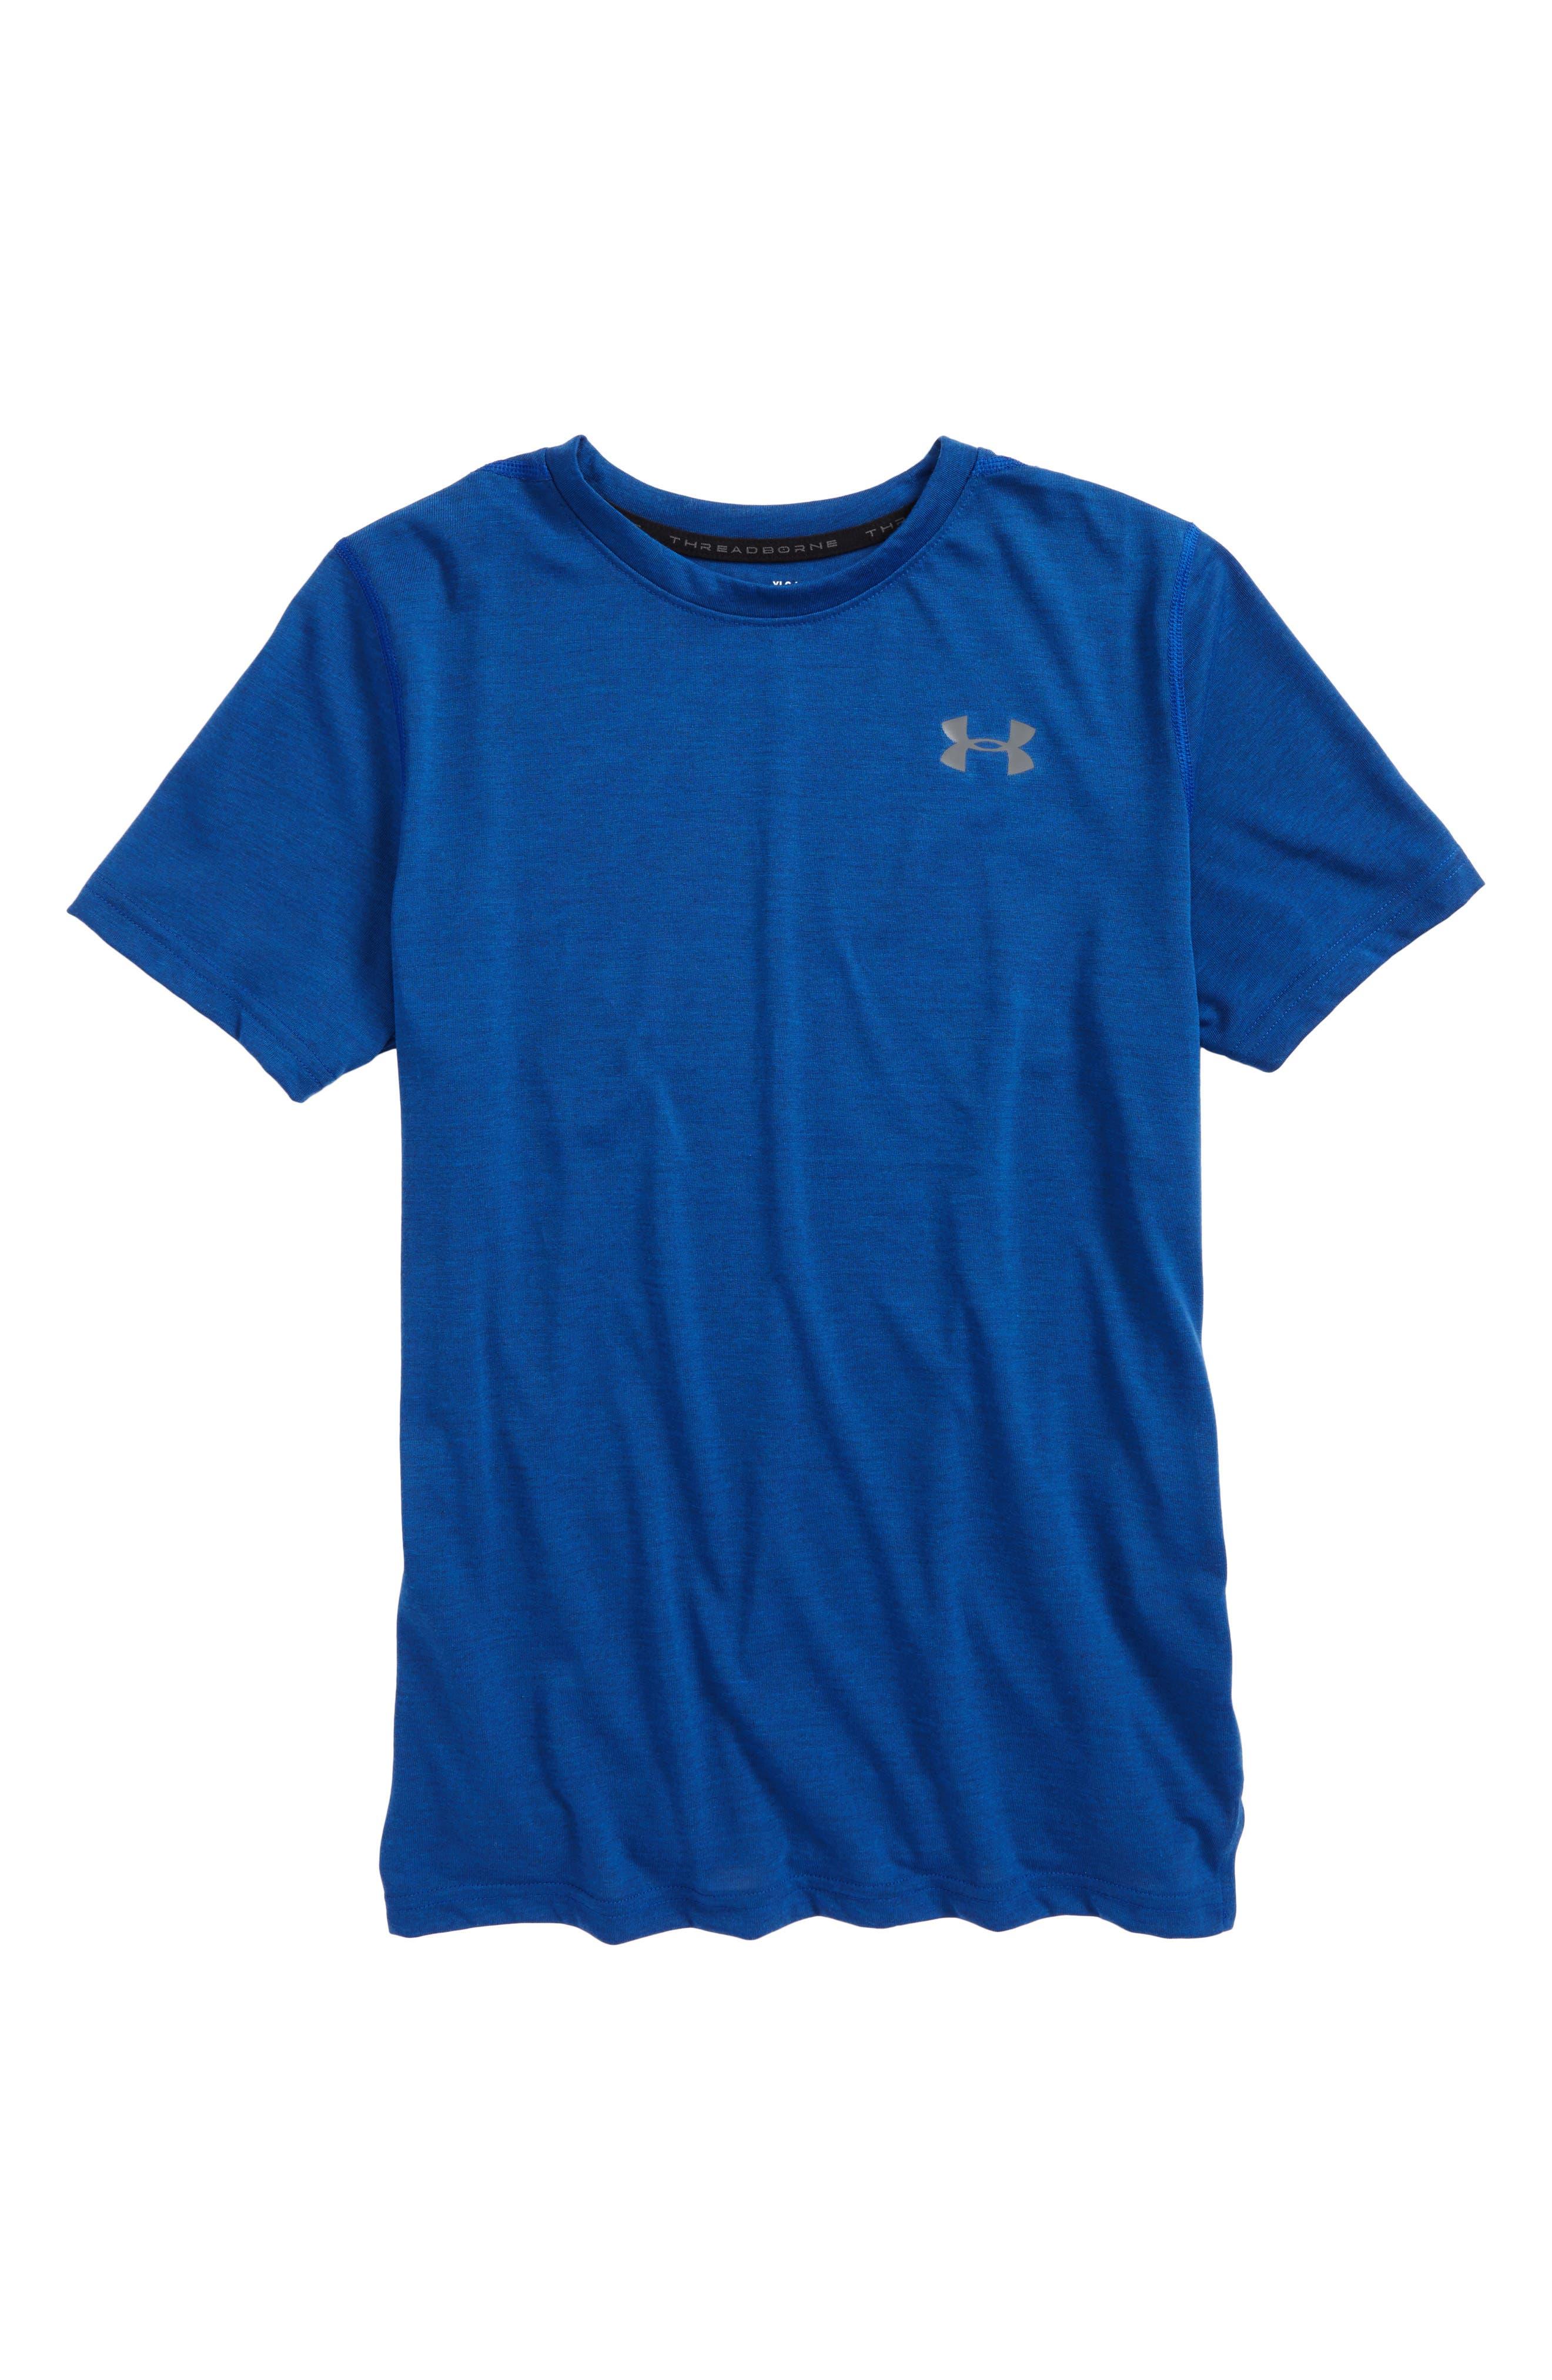 Under Armour Threadborne T-Shirt (Big Boys)